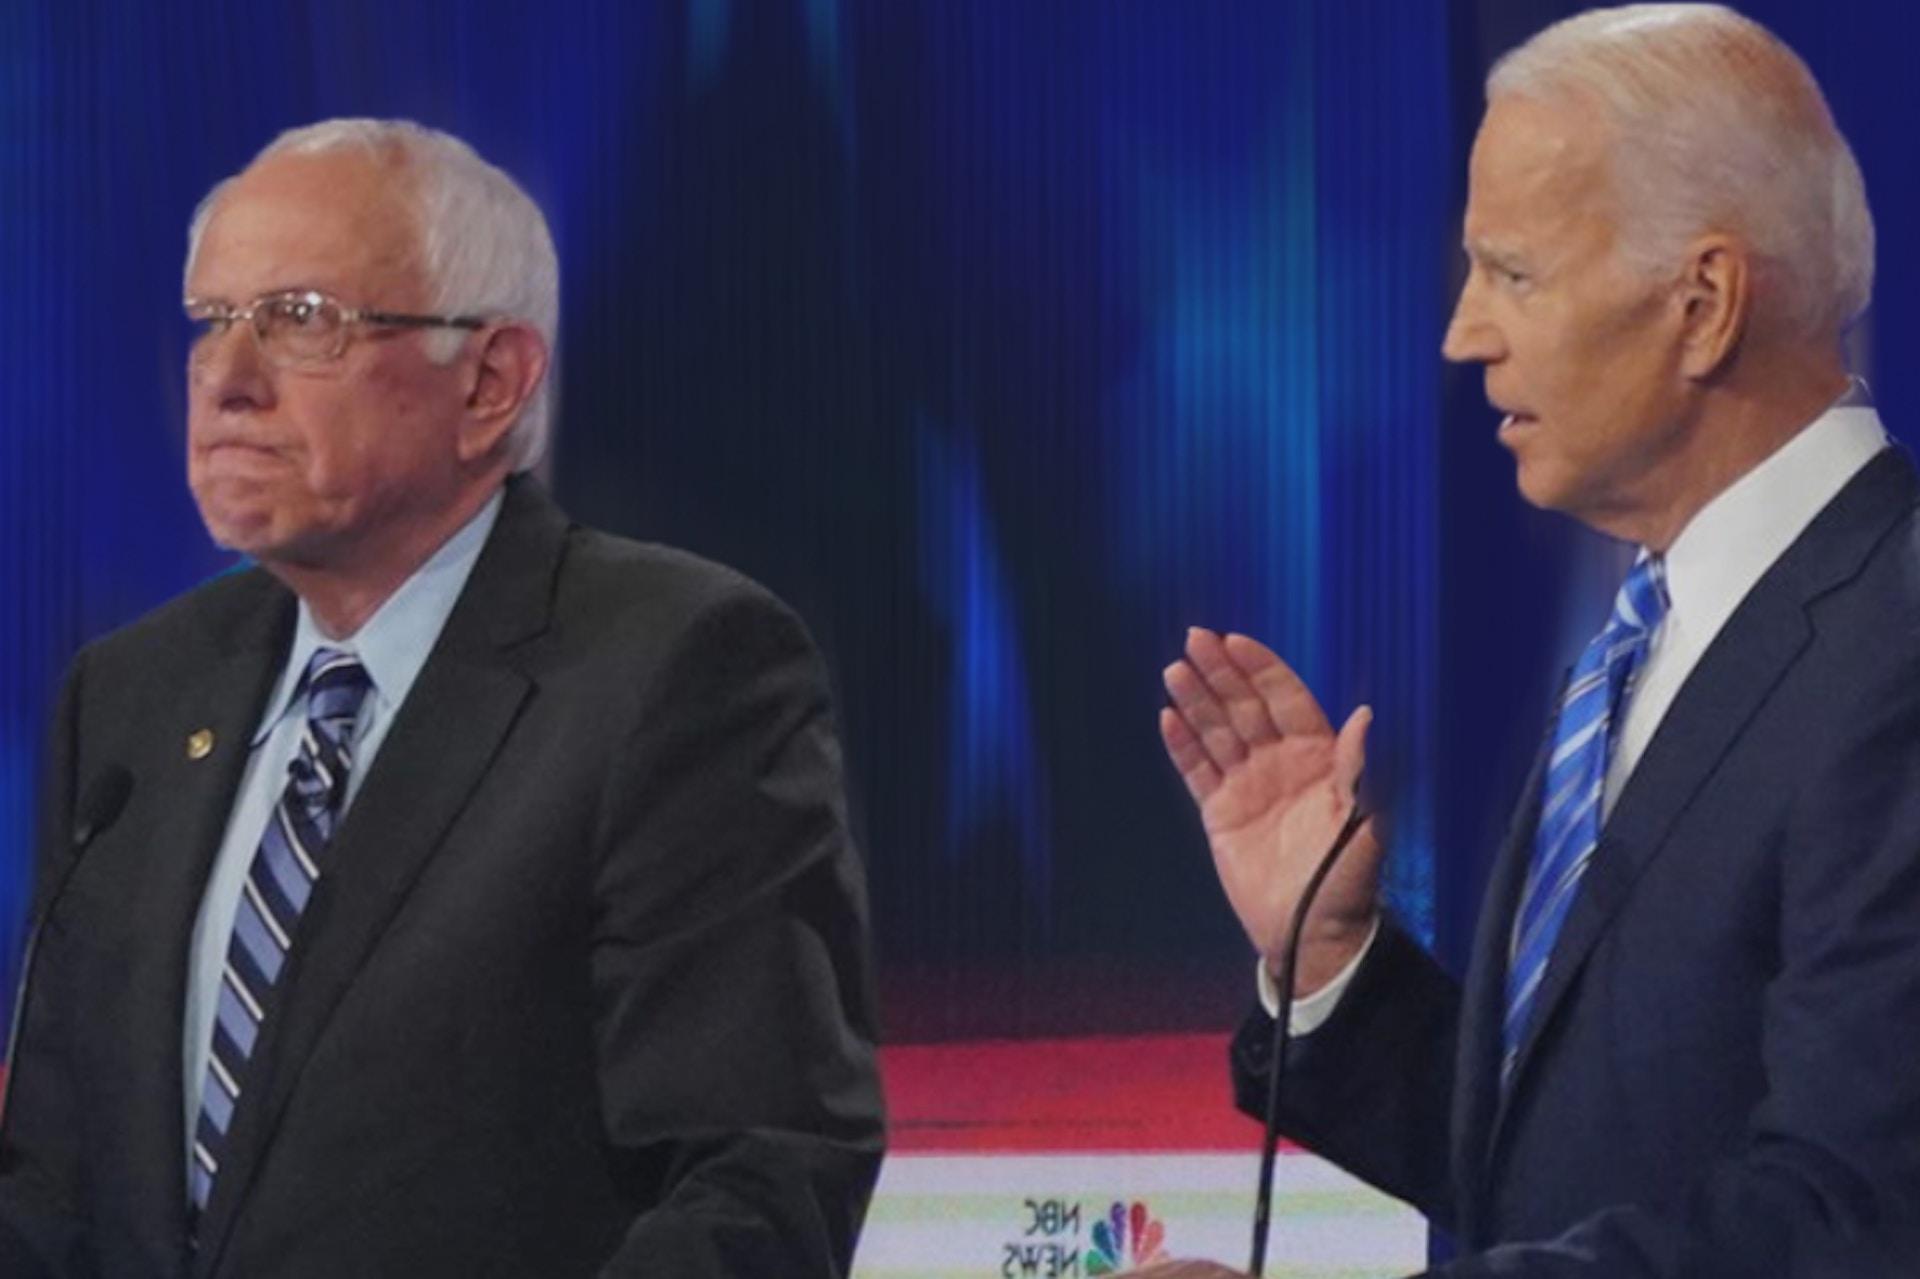 social media insights from democratic debate